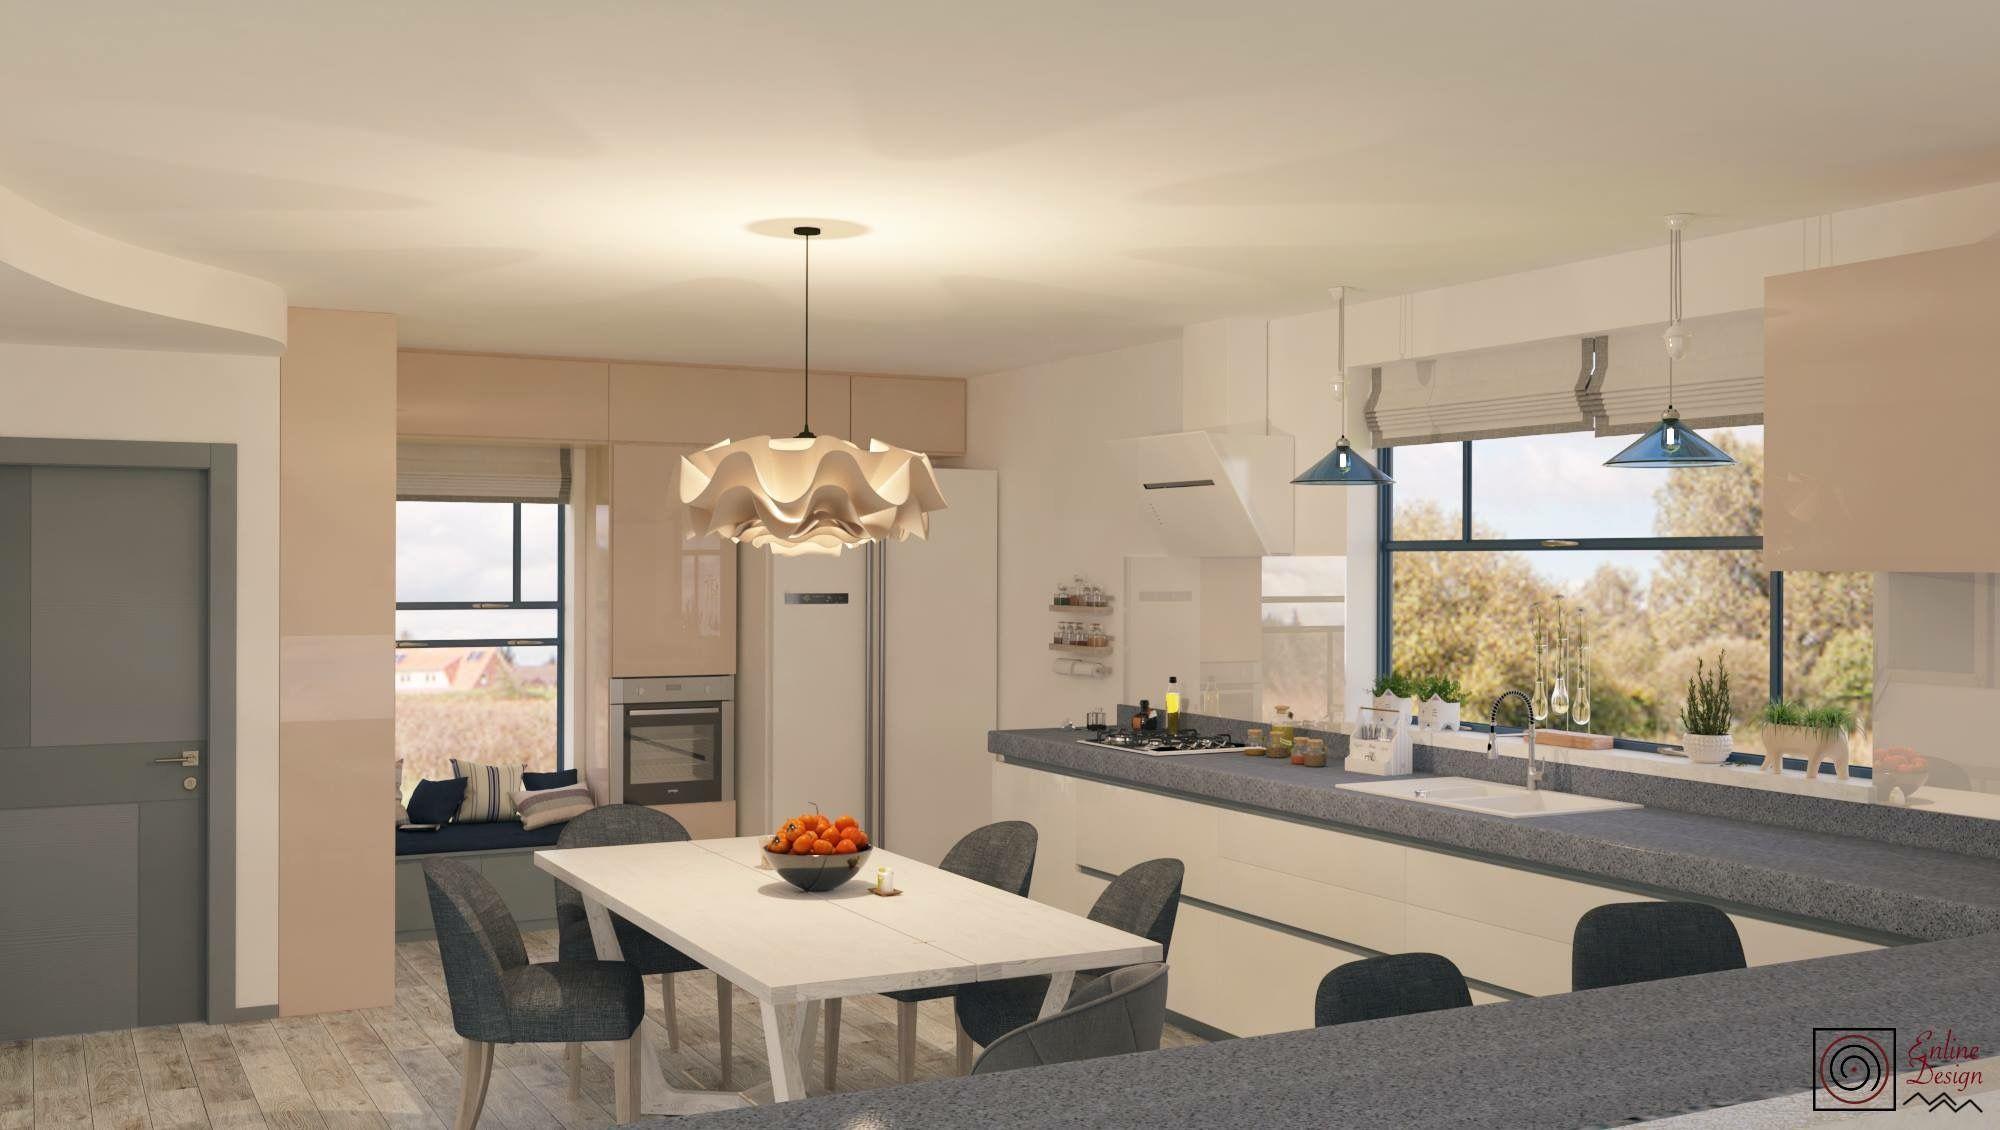 Peach kitchen. Modern sweet and comfortable kitchen design by ENLINE DESIGN.